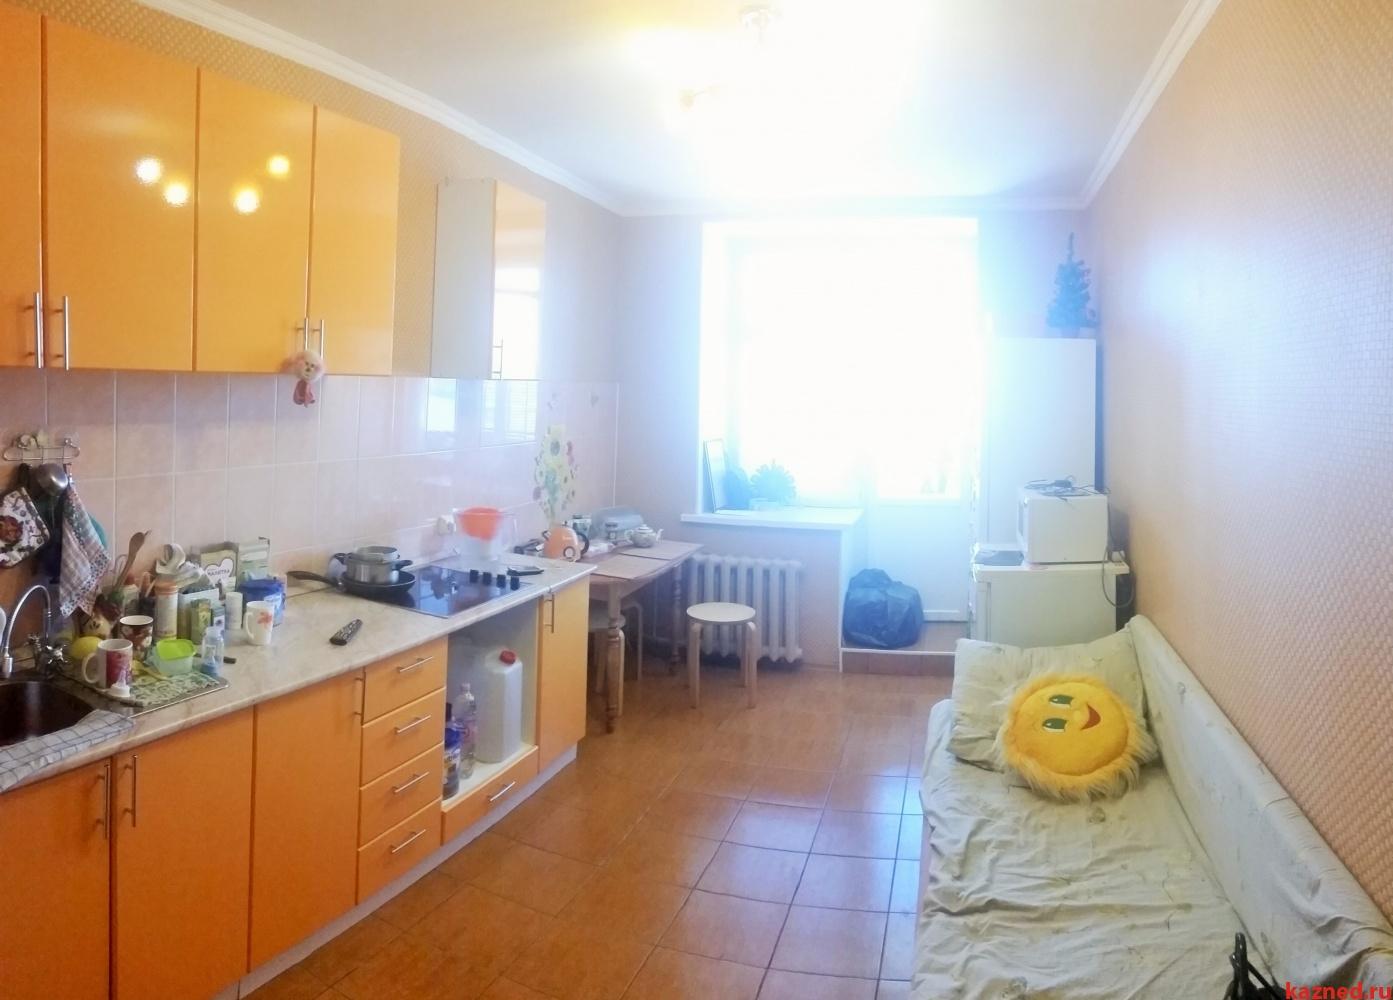 Продажа 1-к квартиры Баки урманче, 8, 47 м²  (миниатюра №1)